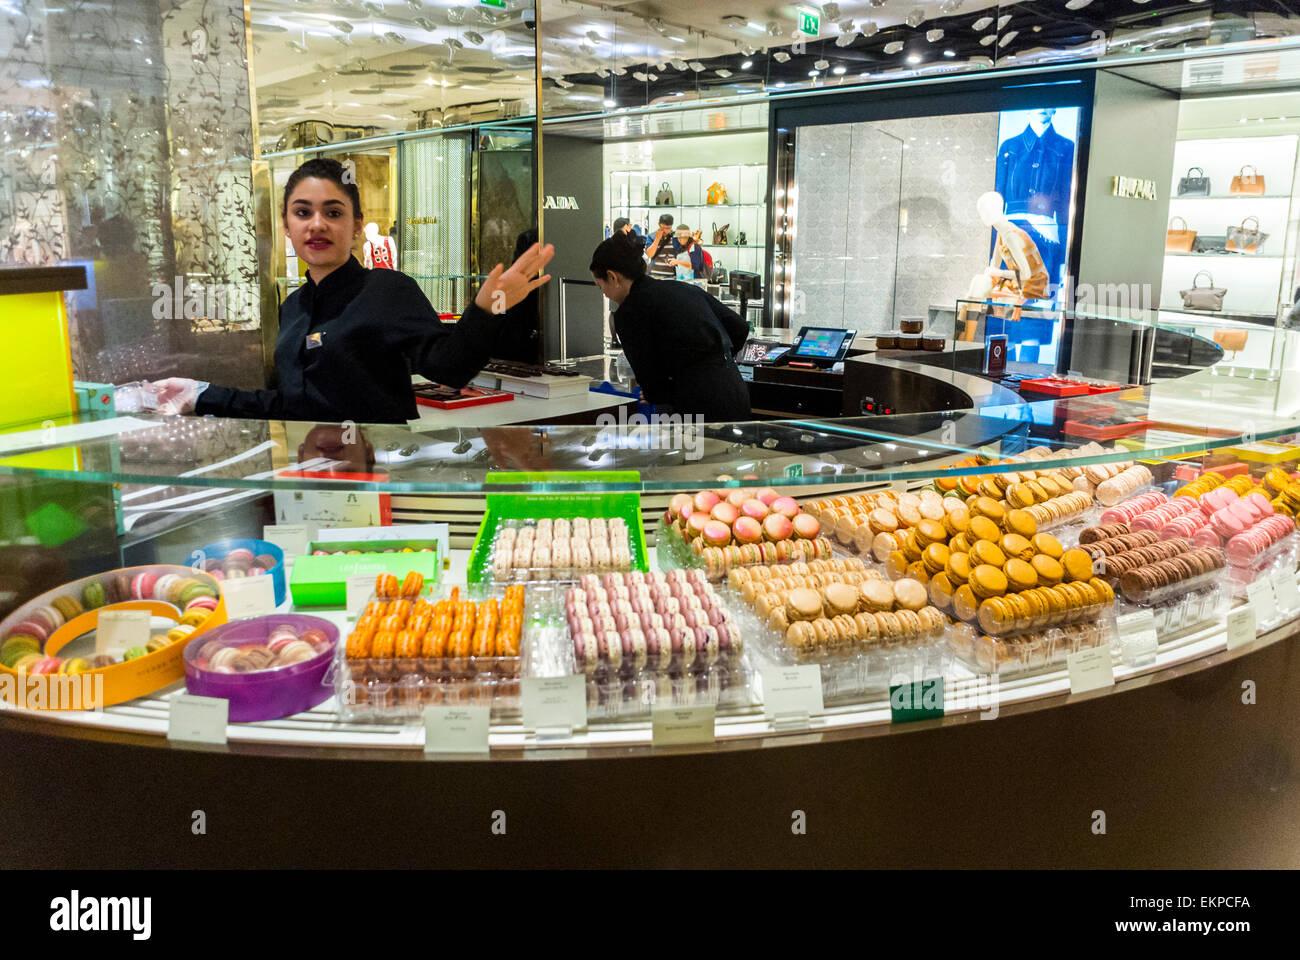 Paris, France. Woman Clerk Waving in French Chocolatier, Macaroons, Pastries Store 'Pierre herme'  in Department - Stock Image